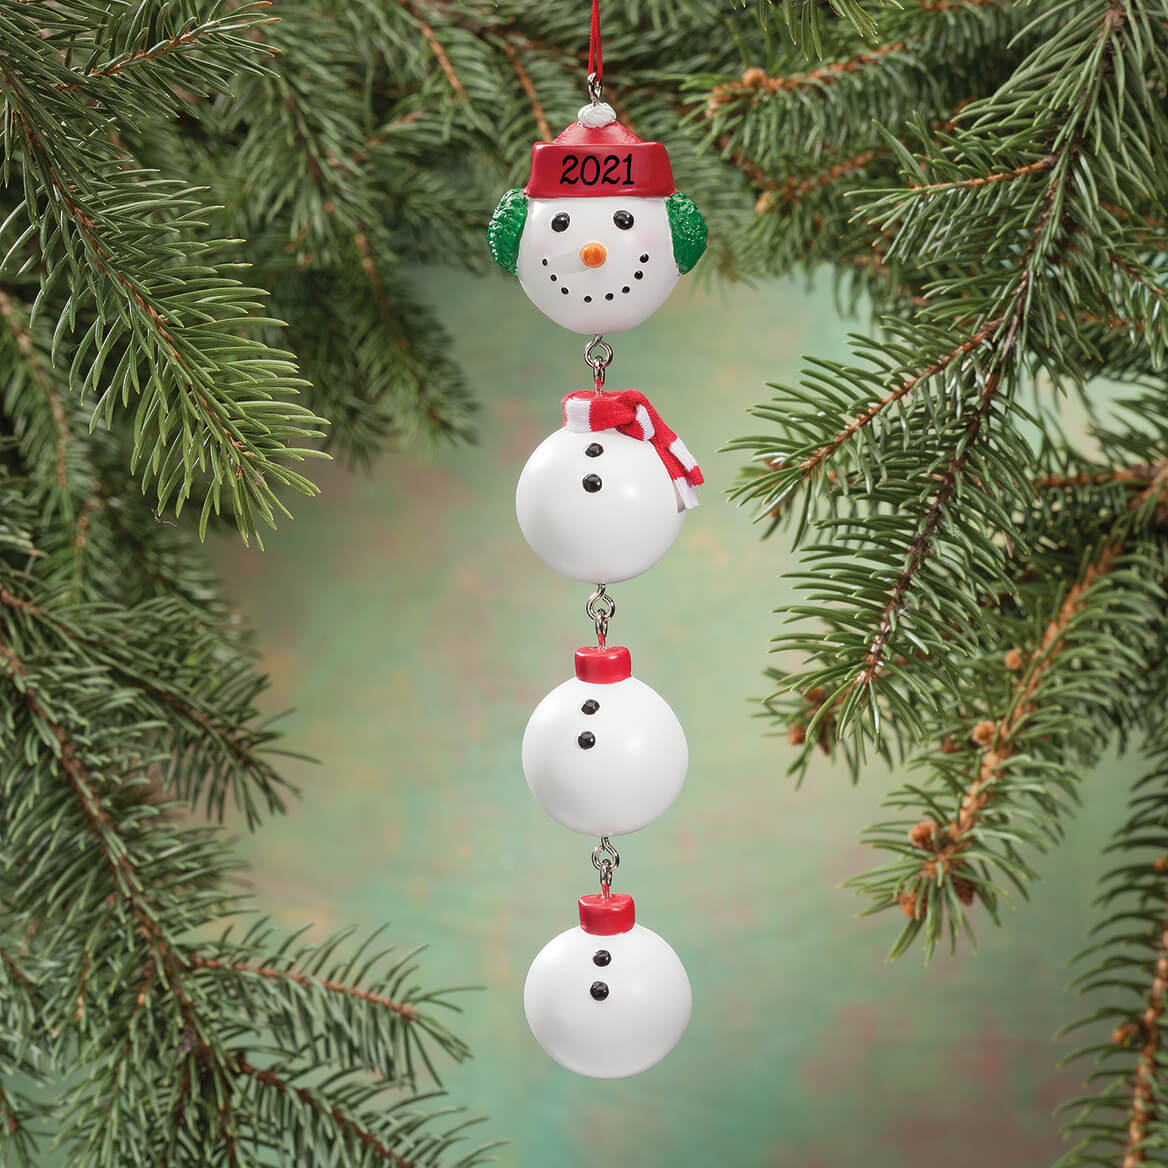 Snowman Family Ornament Snowman Christmas Ornament